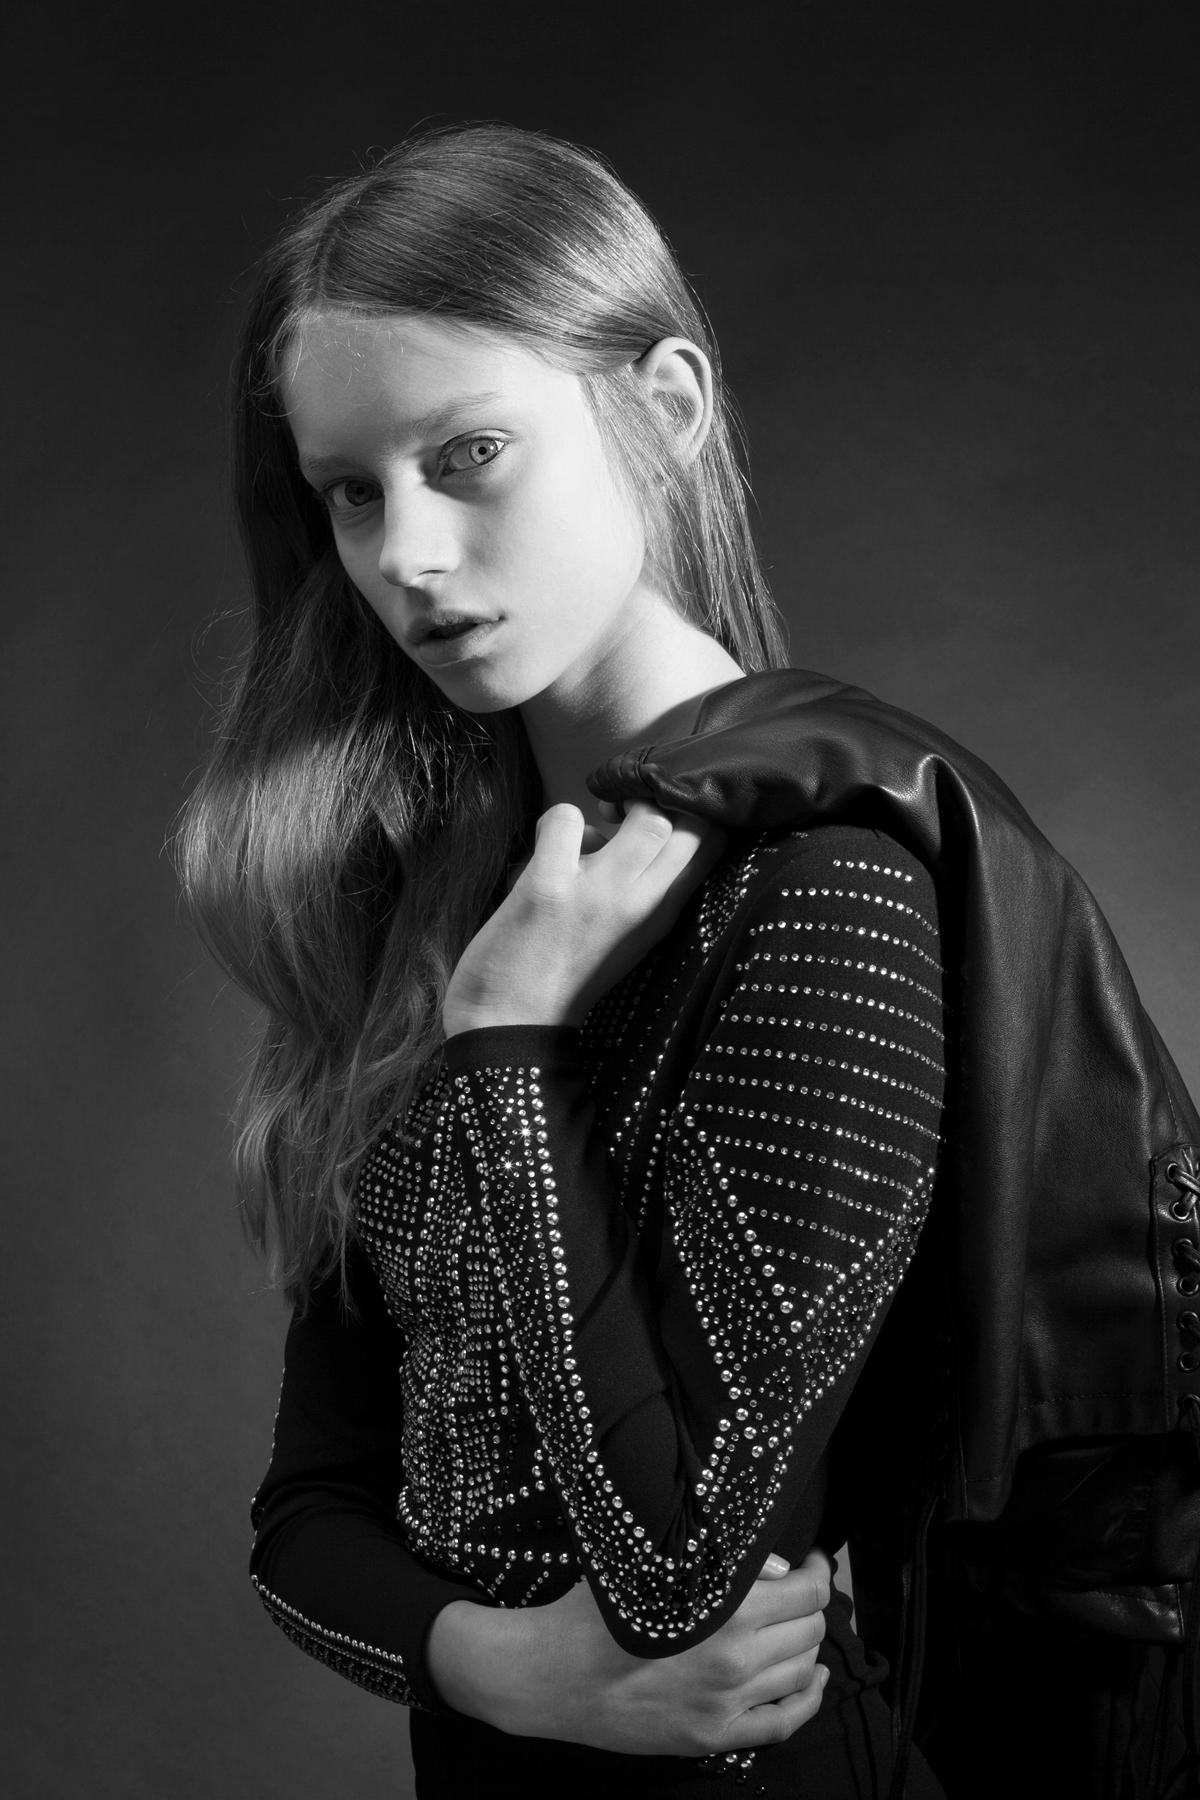 Zwart-wit studioportret